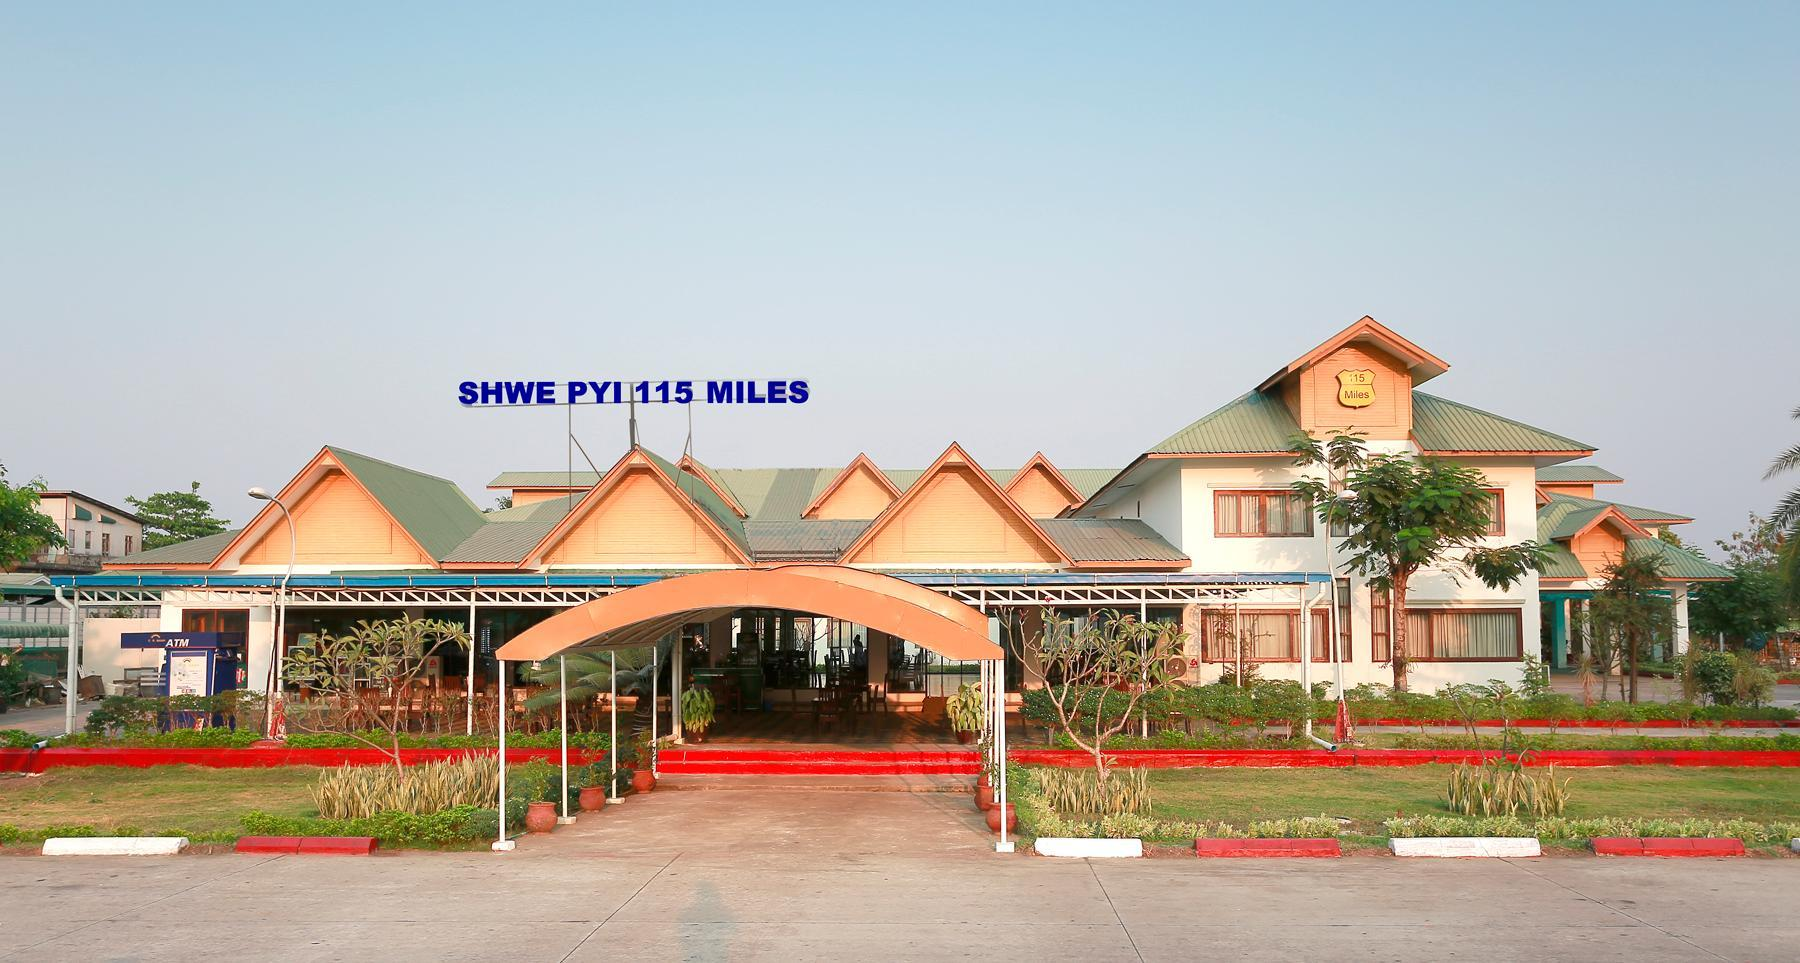 Shwe Pyi 115 miles, Taungoo